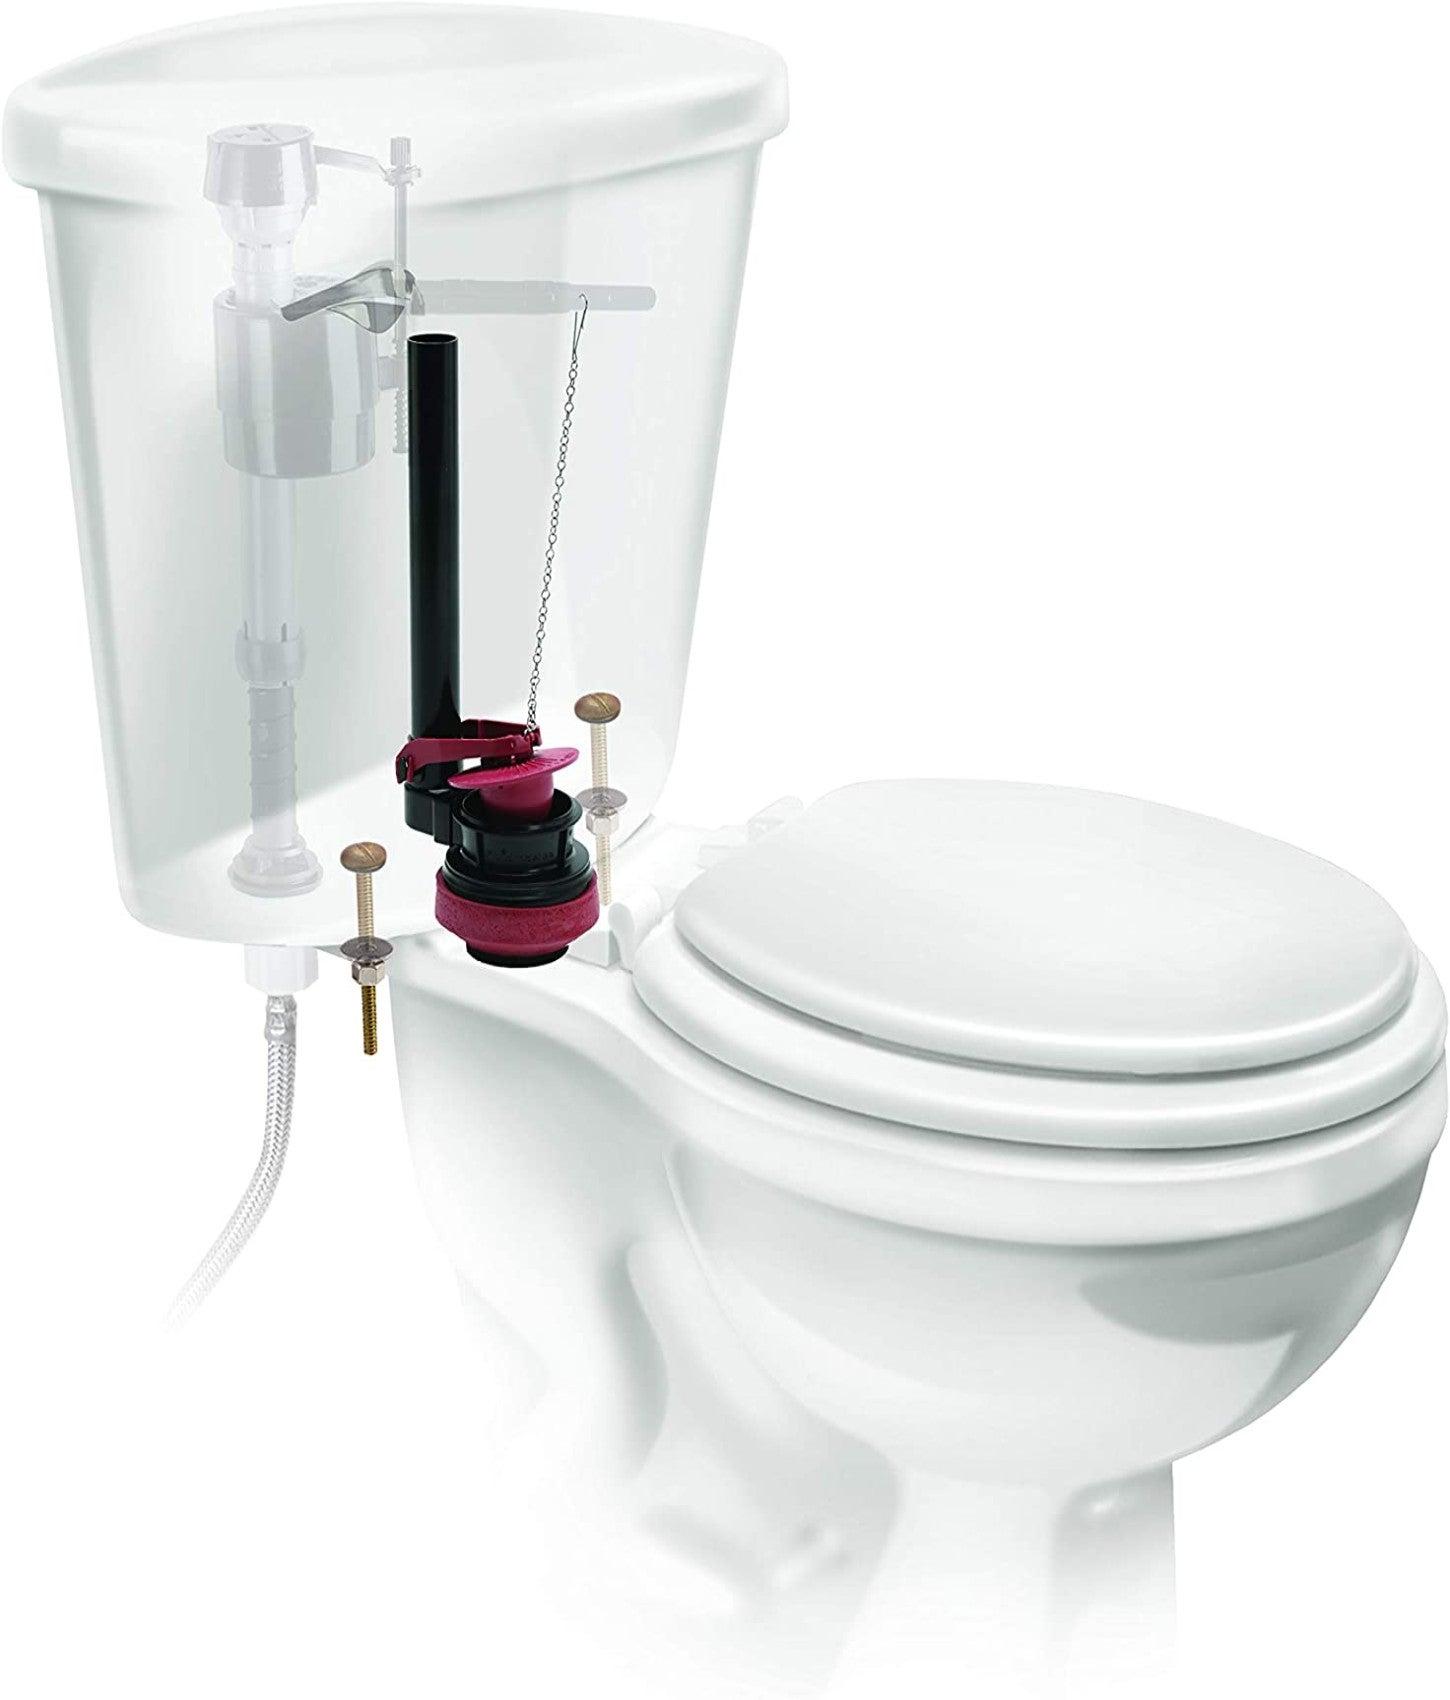 The Best Toilet Repair Kits For Your Plumbing Problems Bob Vila